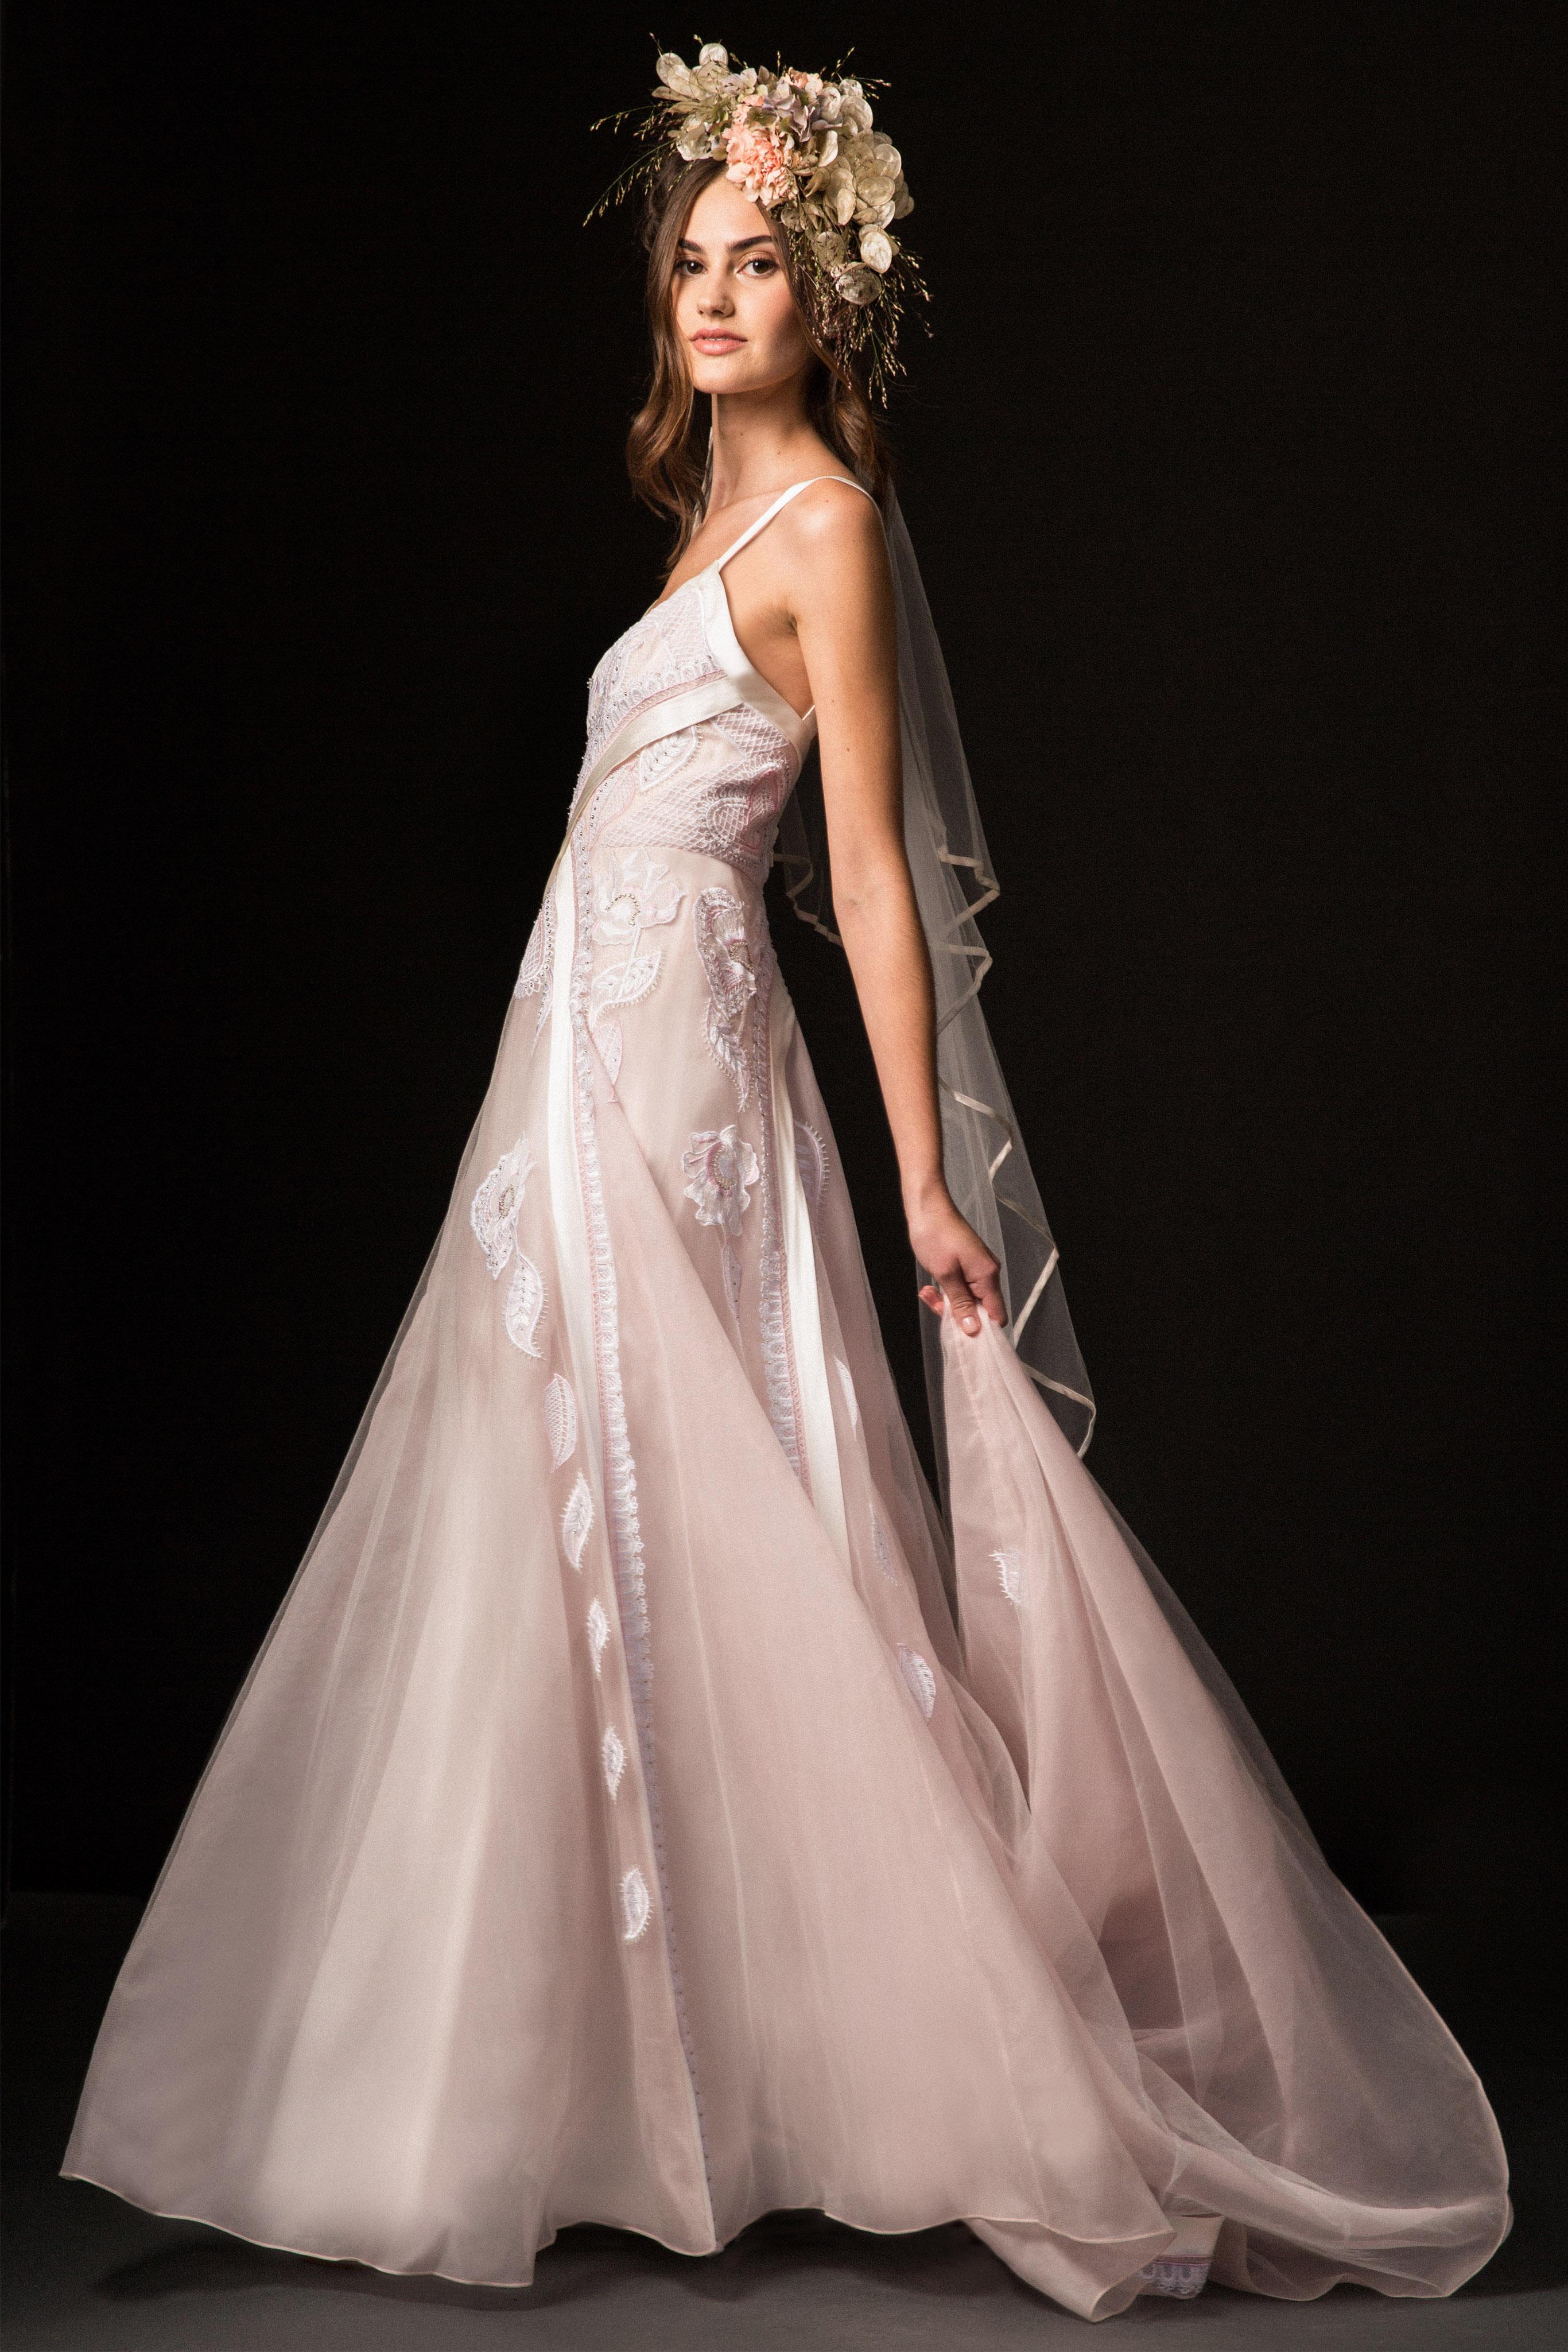 temperley fall 2019 spaghetti strap a-line pink wedding dress